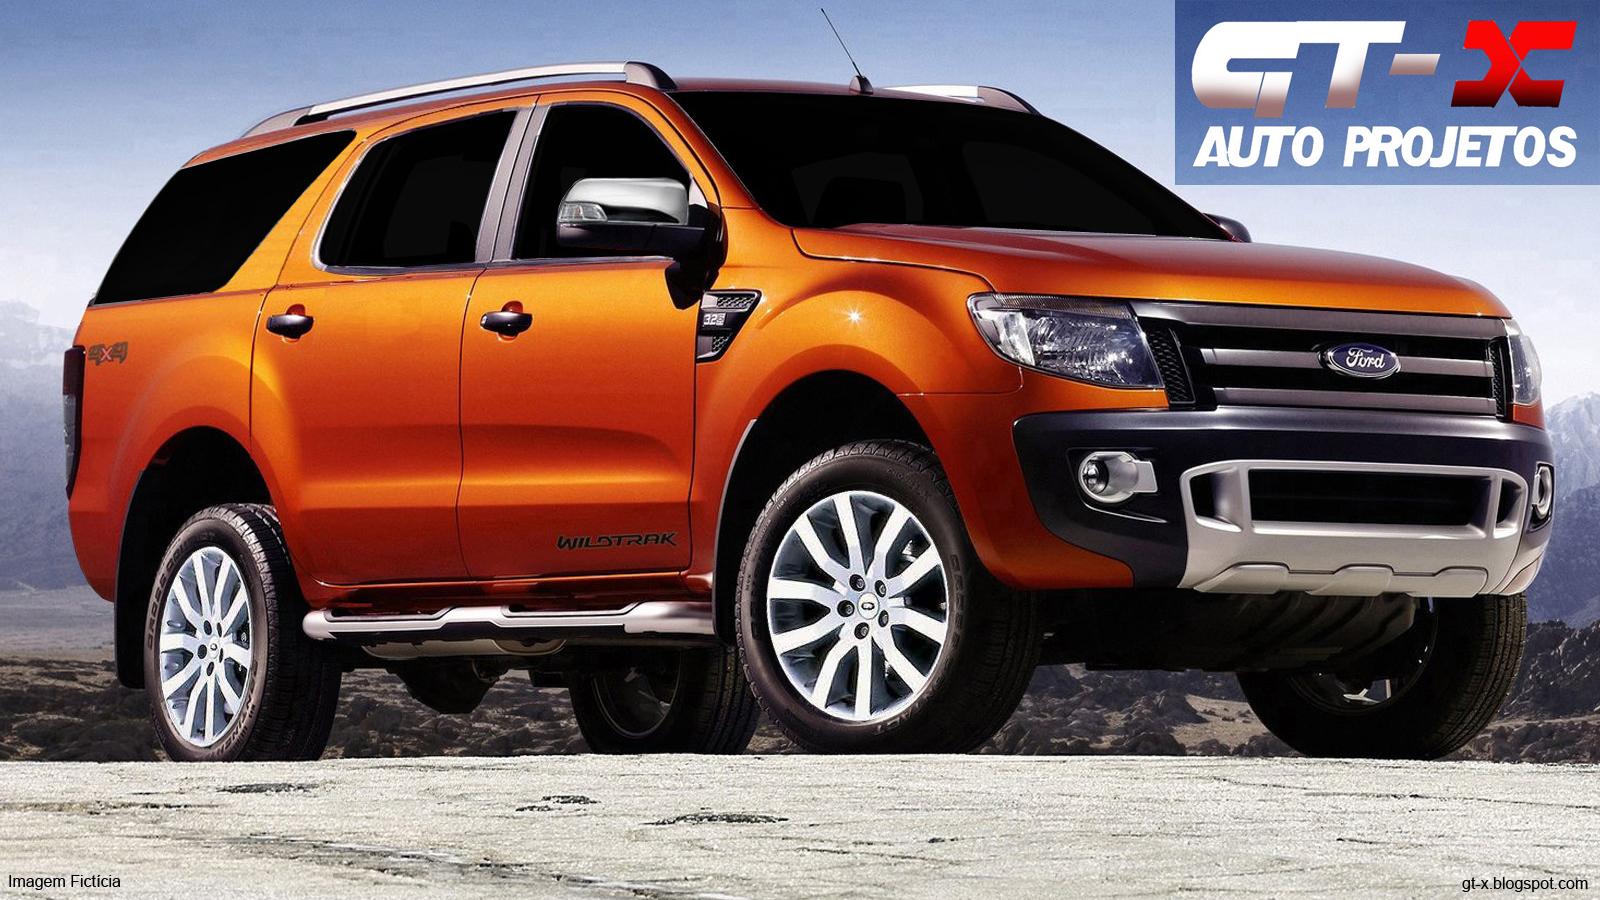 2013 Ford Everest Preview - Futura concorrente da Chevrolet Blazer